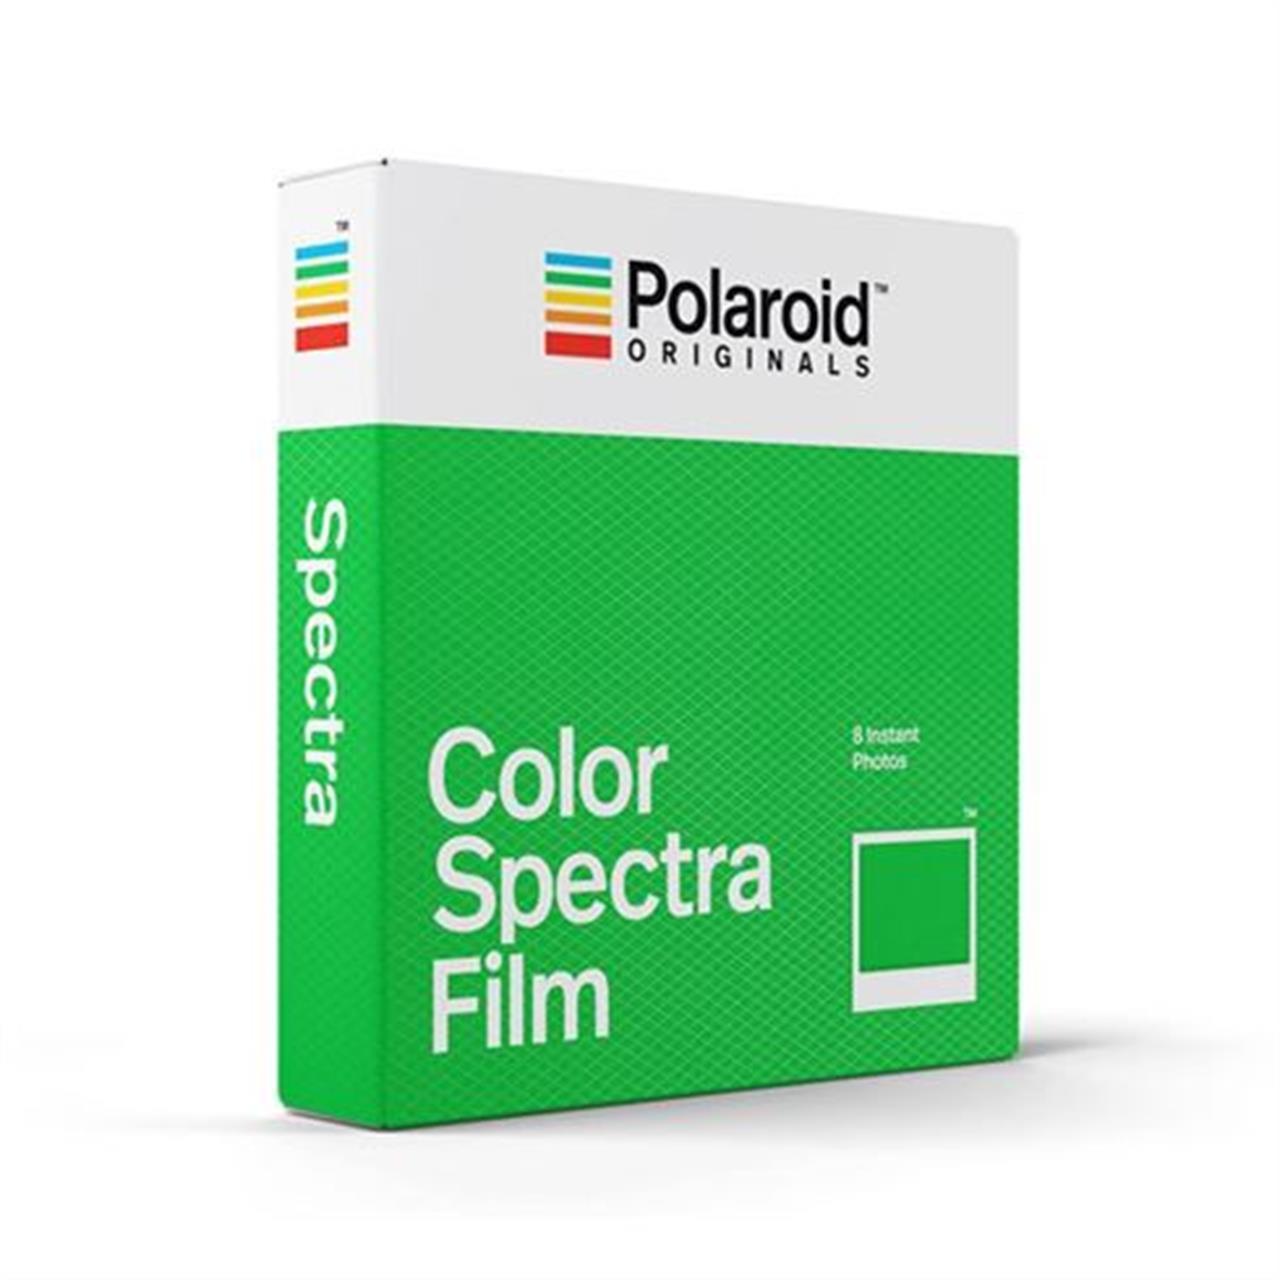 9120066087812__polaroid_color_spectra_film.jpg